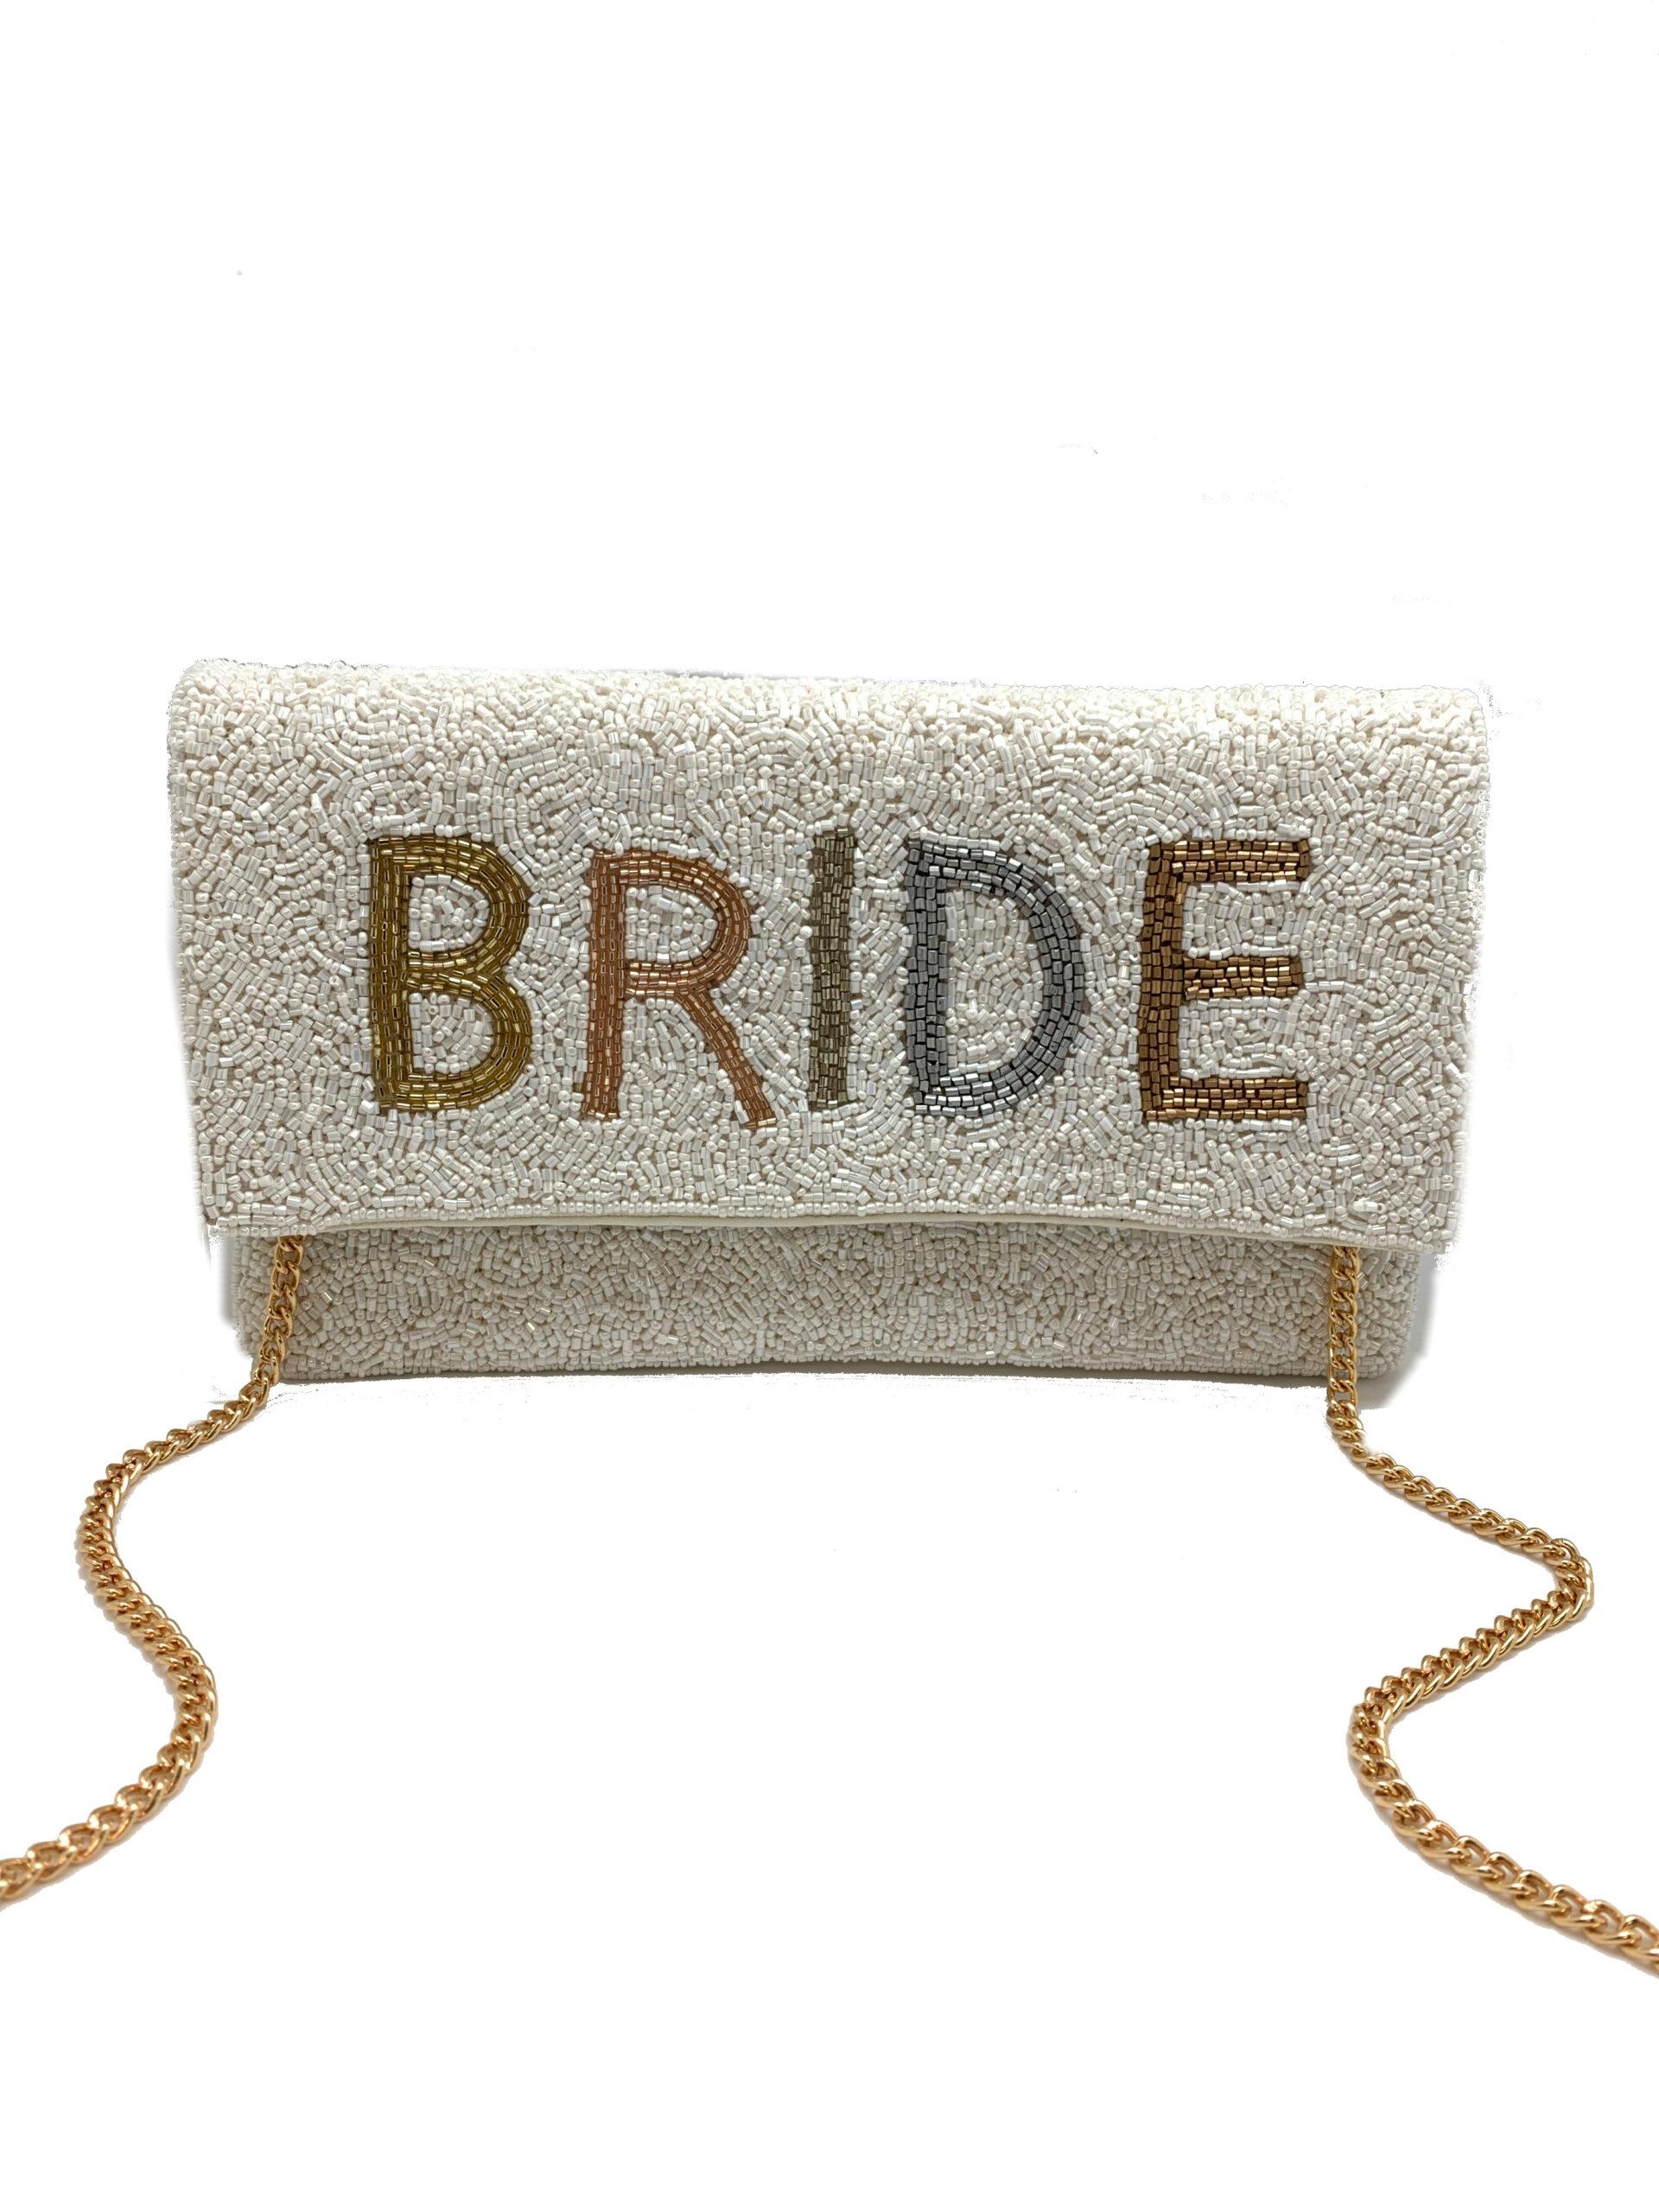 OMBRE BEADED BRIDE BAG